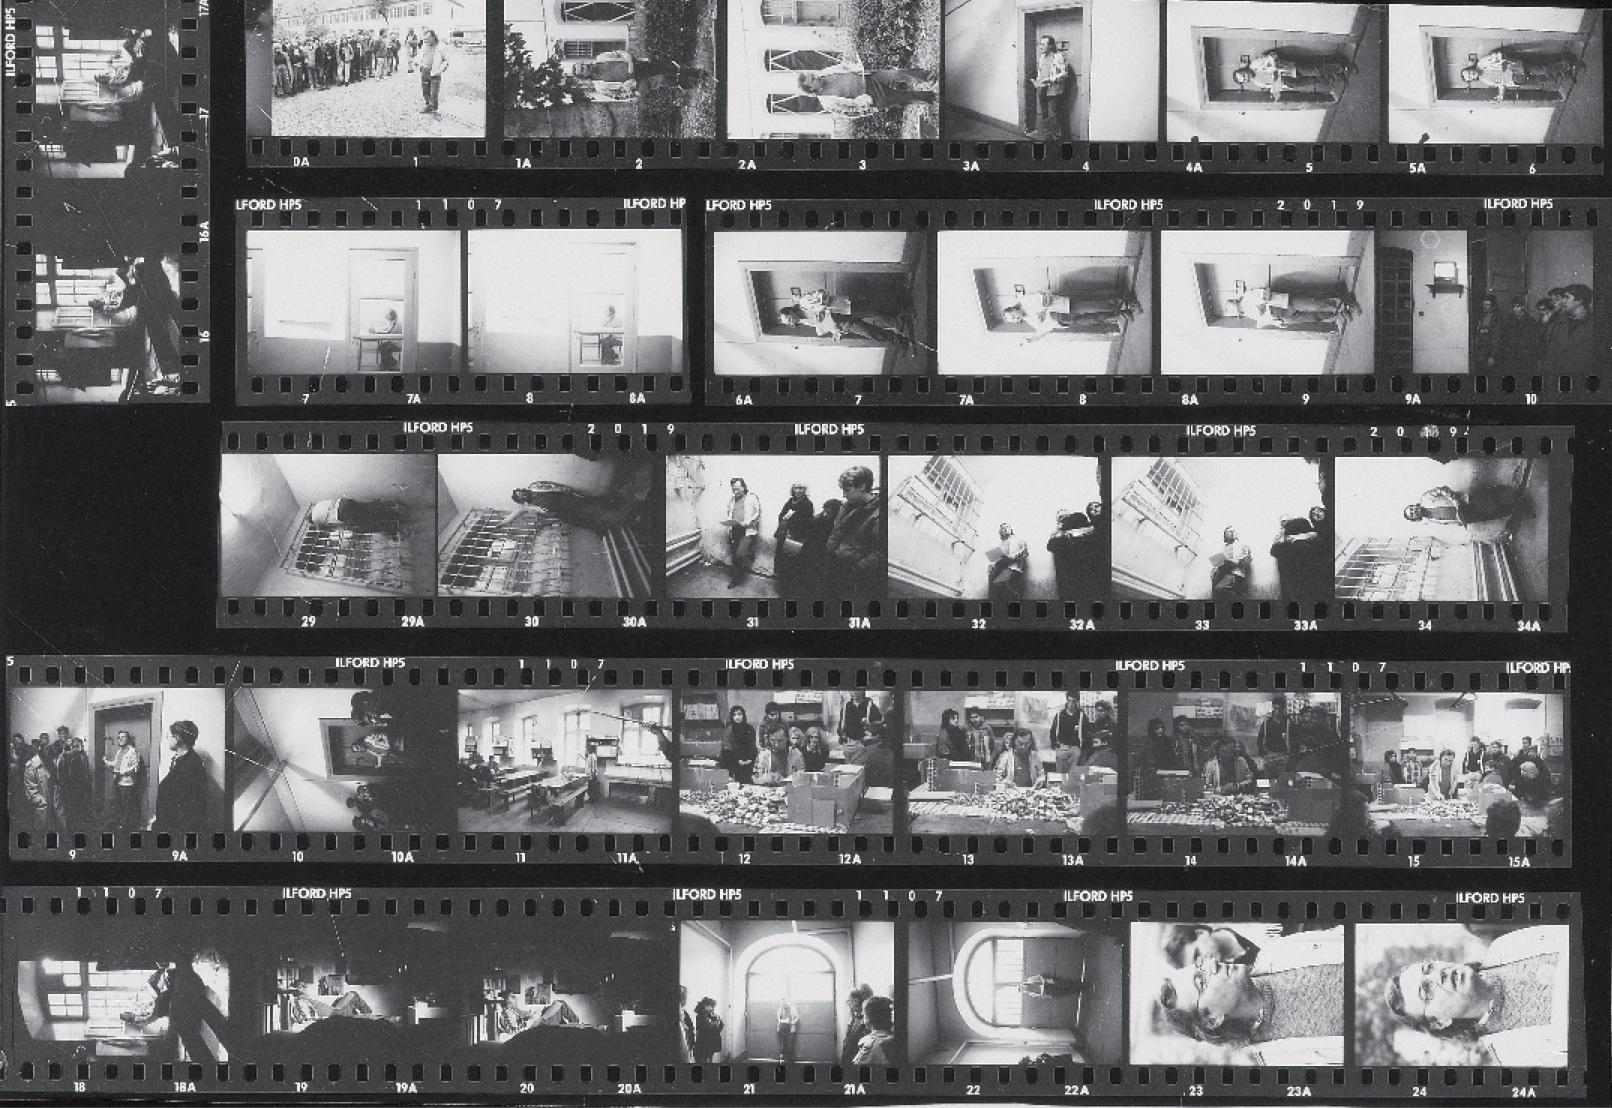 AndréPOMARATdanslescouloirs,cellules,ateliers,dortoirsetparloirsdel'anciennePrisonSainte-Marguerite(1988).Planchecontact.Photographe:EvelyneWICKY.Archives,Strasbourg.